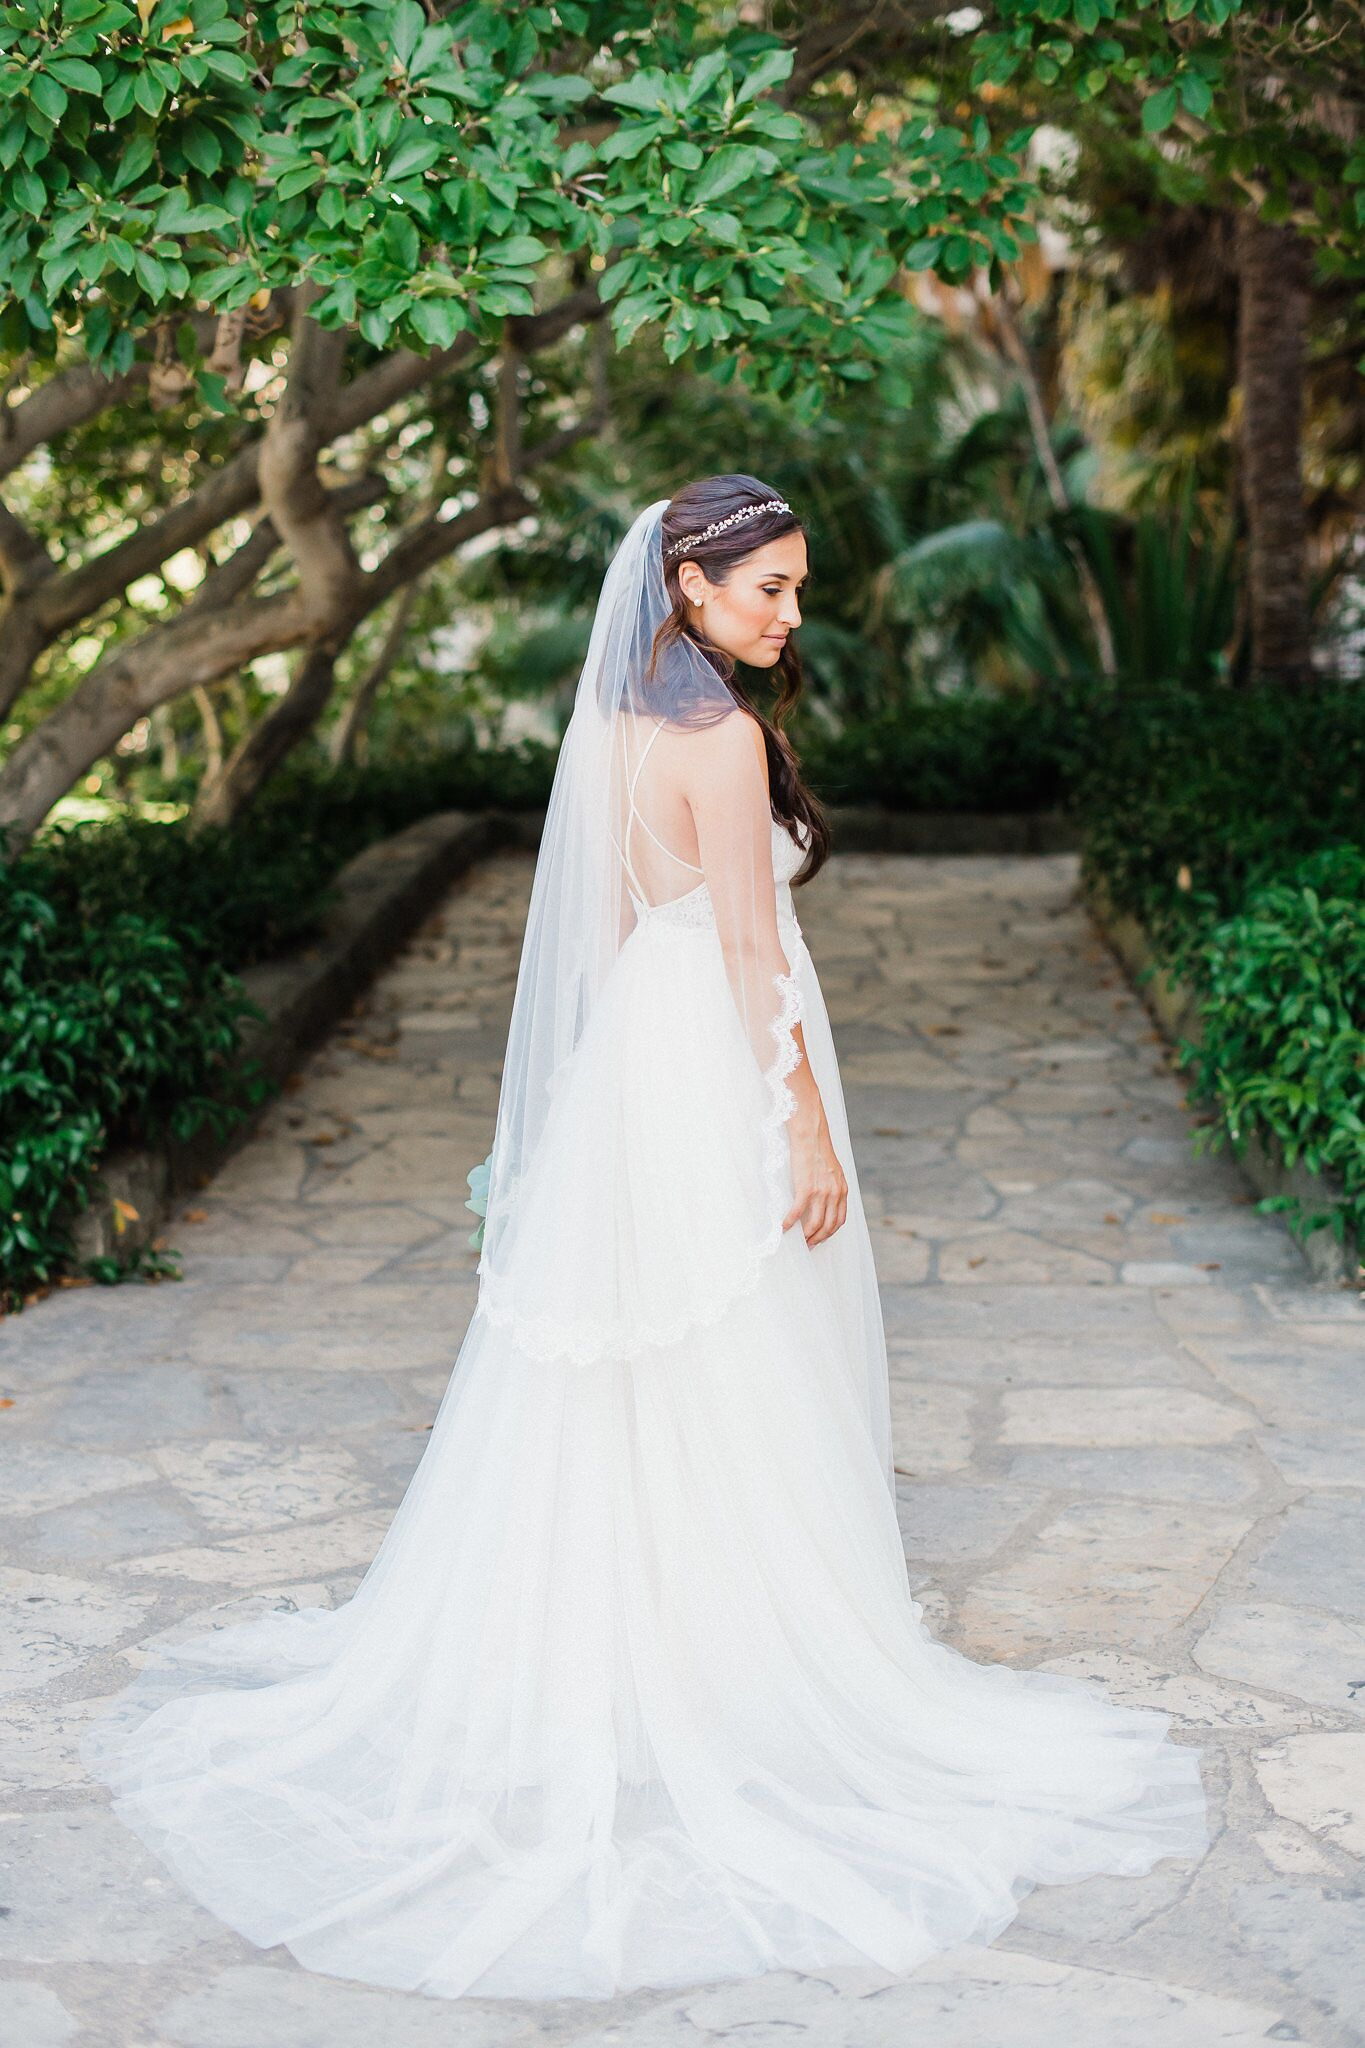 www.santabarbaraweddings.com | Photographer: Grace Kathryn | Venues: Villa & Vine, Santa Barbara Courthouse, Hilton Santa Barbara Resort | Coordination: Burlap & Bordeaux | Bridal Portrait